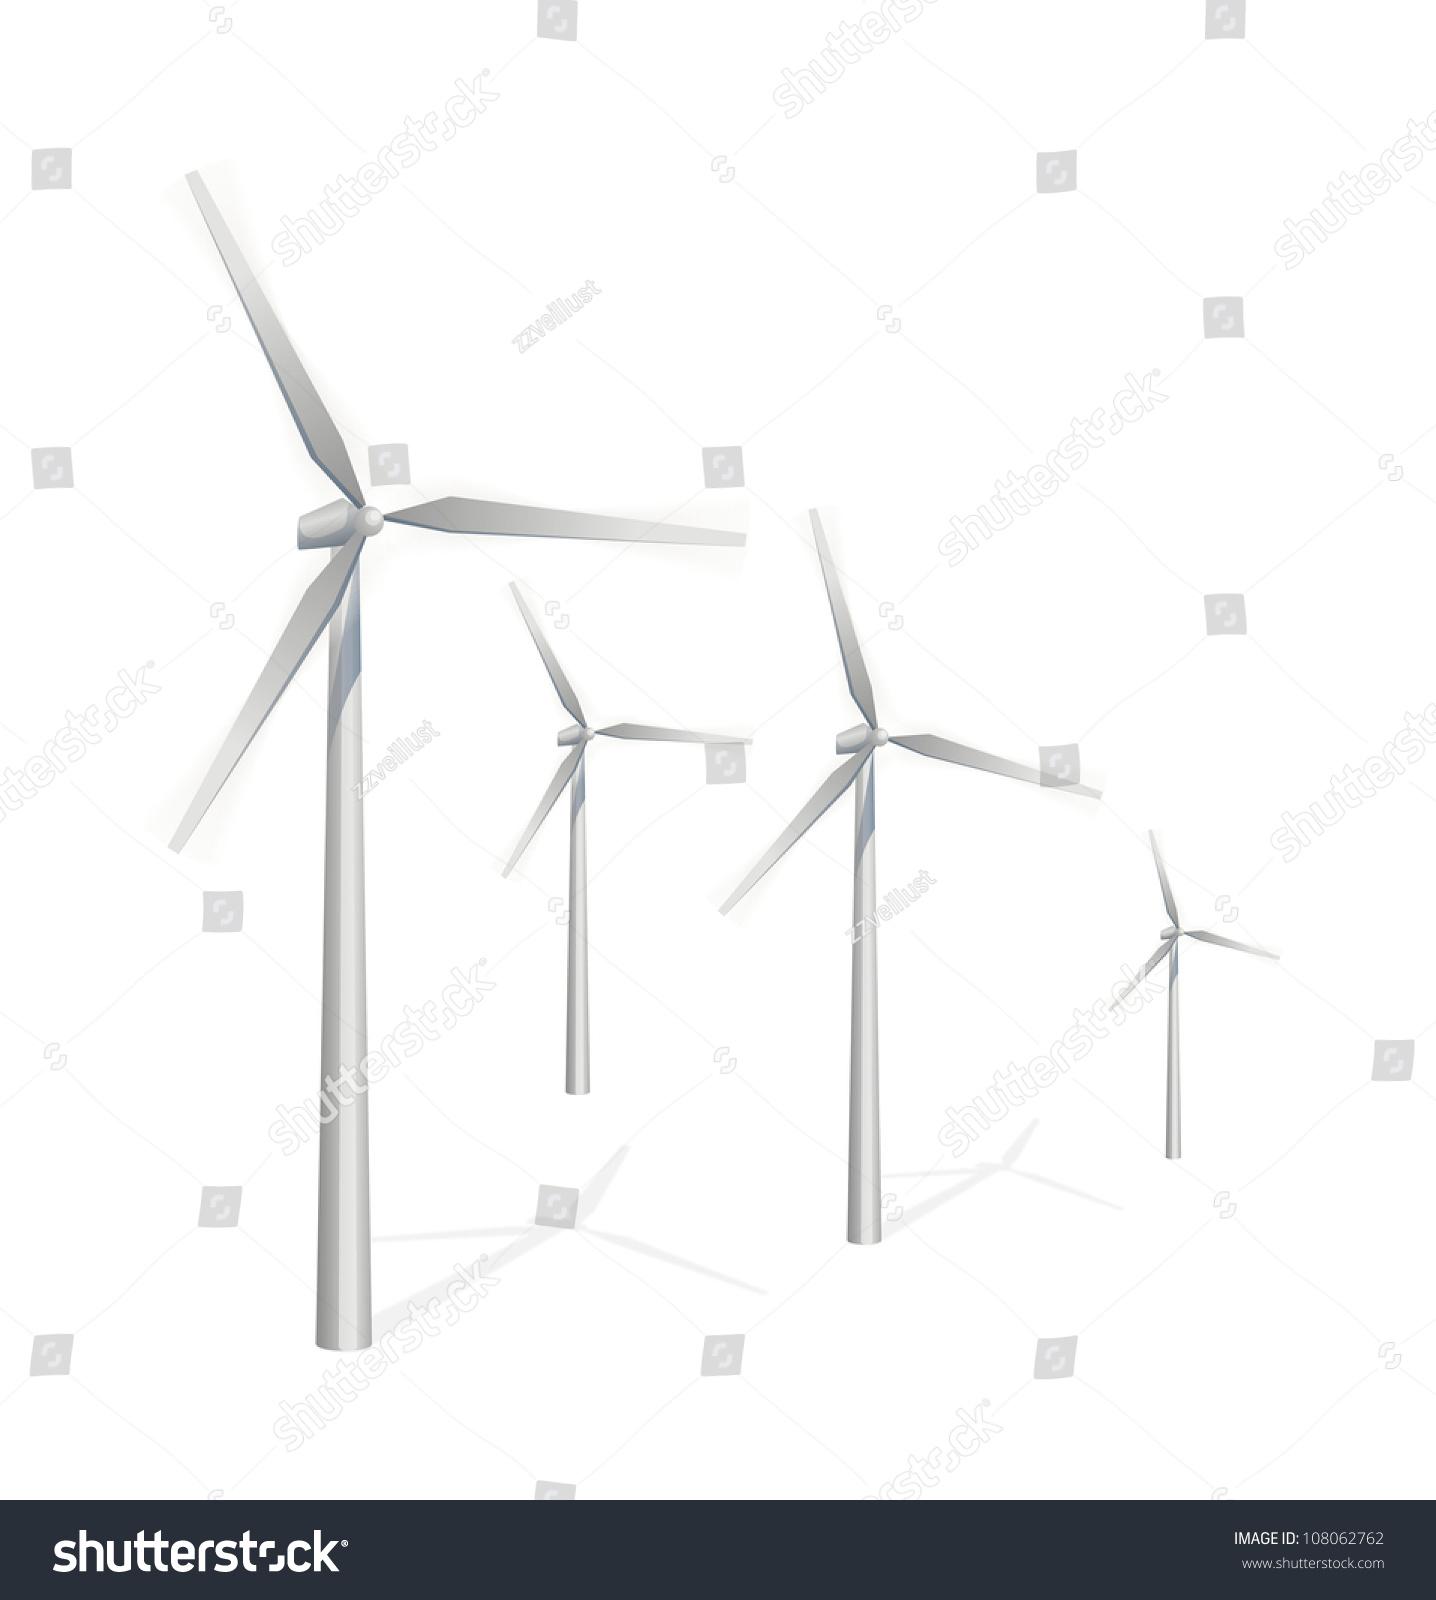 Vector Icon Wind Power Generation Stock Vector